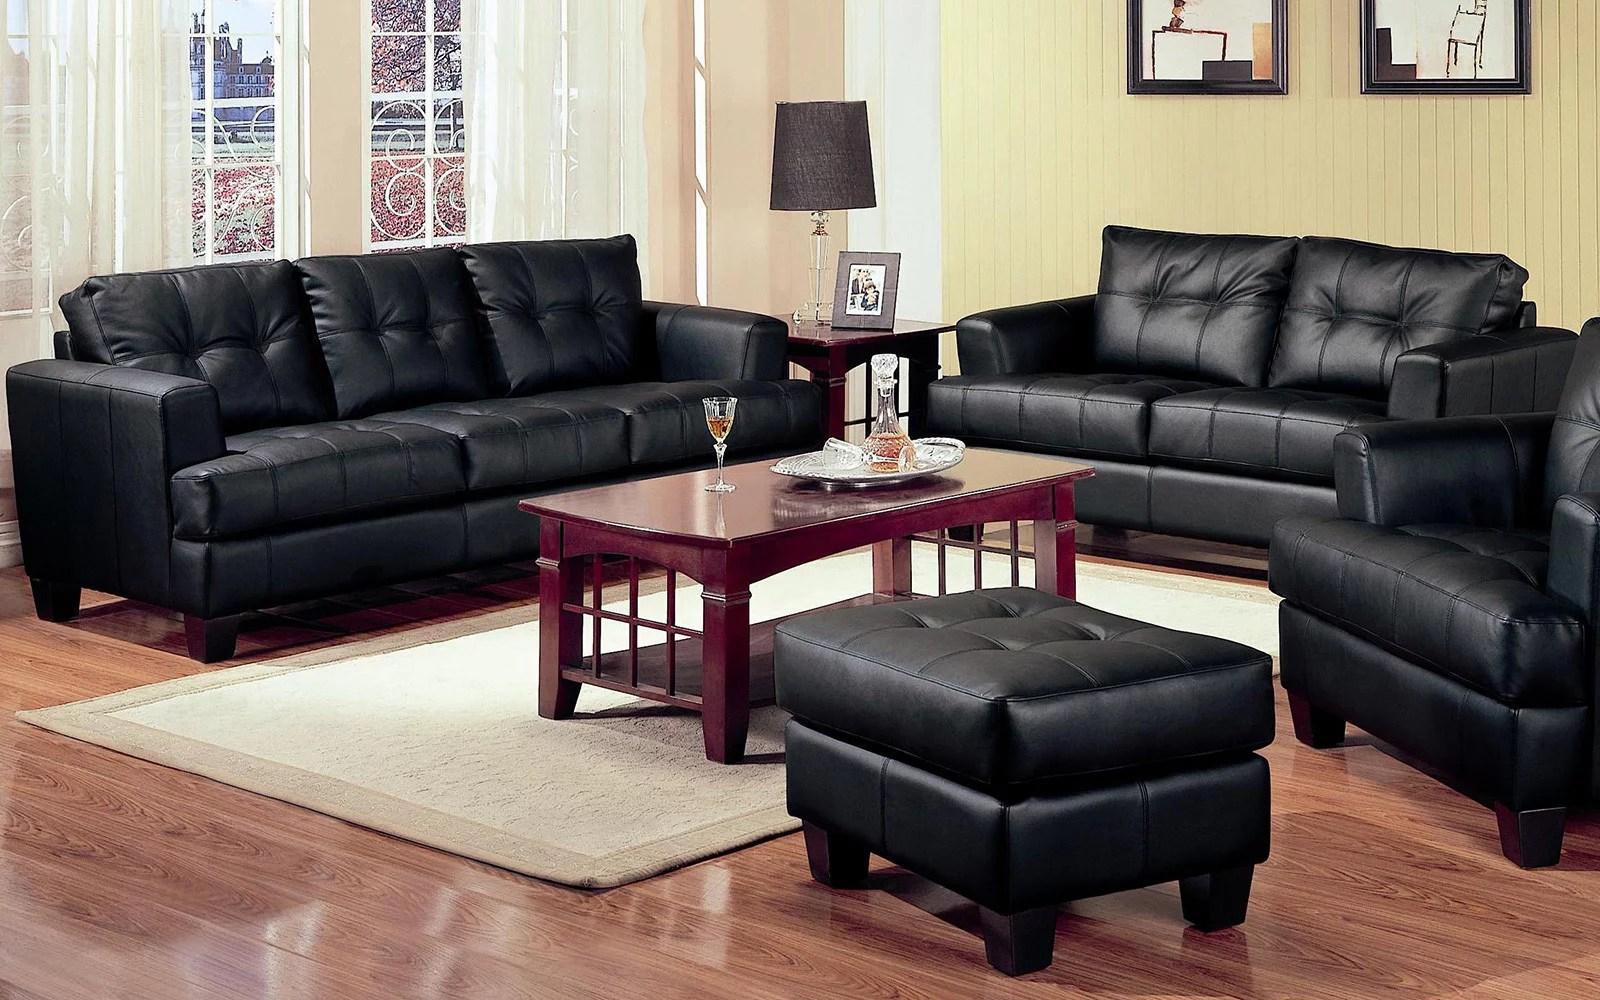 2 piece modern black bonded leather sofa and loveseat livingroom set walmart com